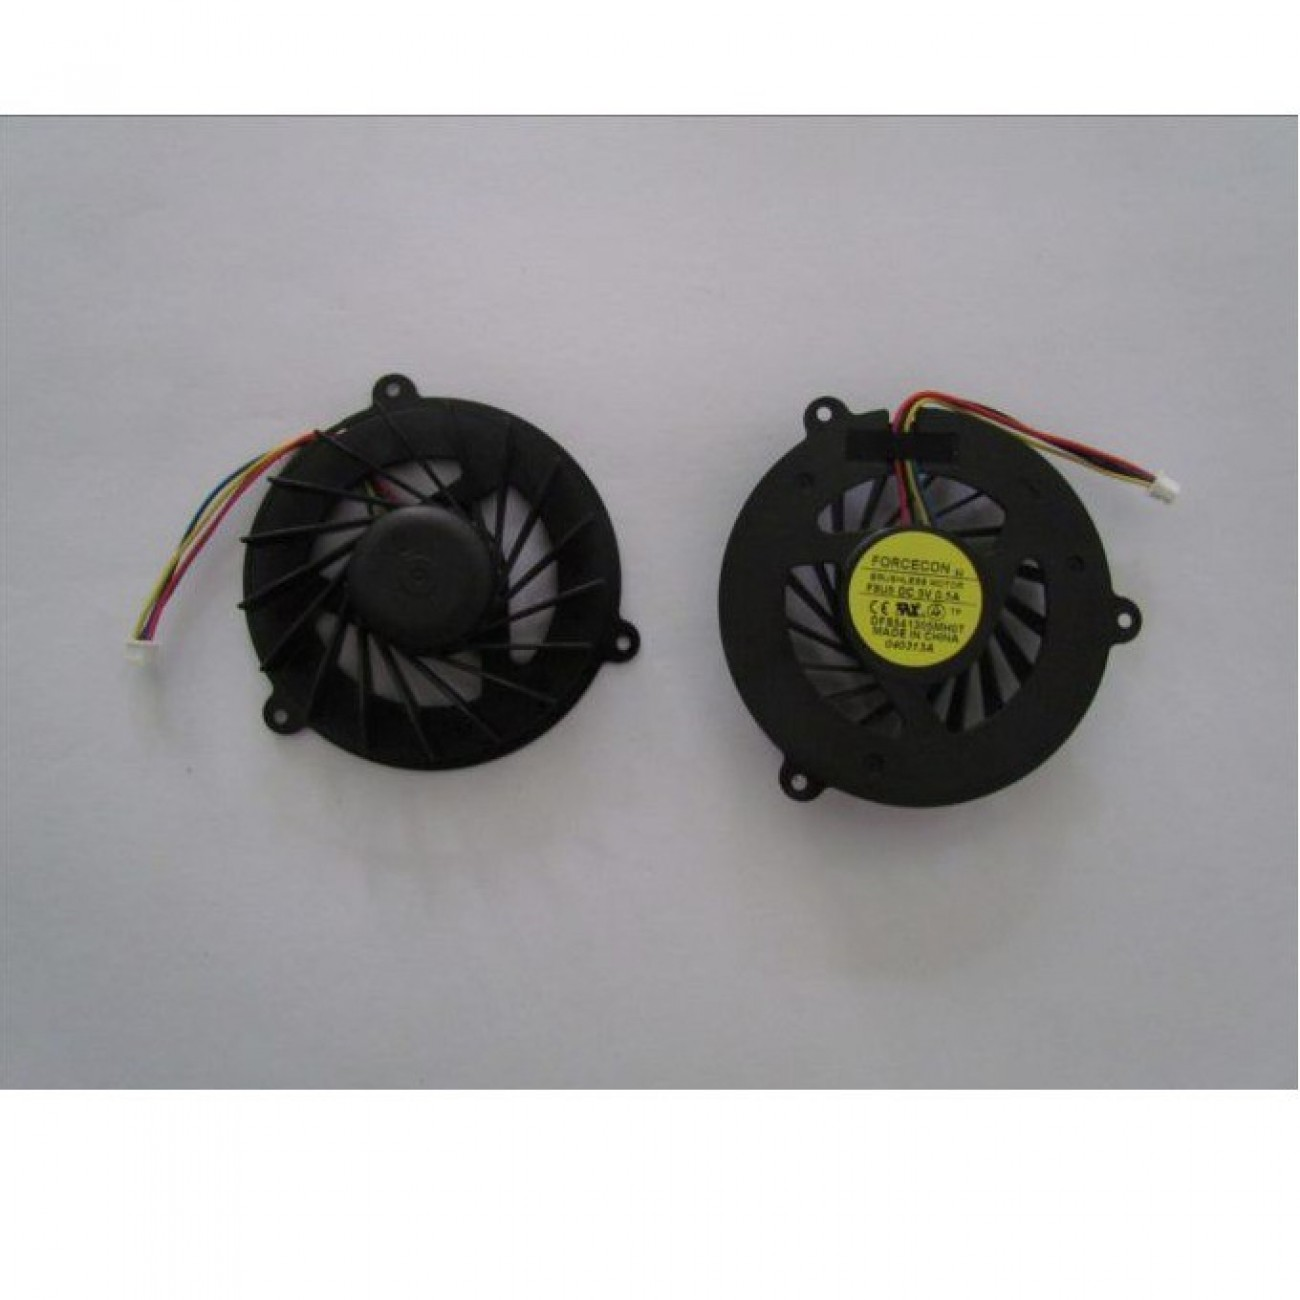 Вентилатор за лаптоп, Asus, K53 K53B K53BY A53U K43T K43B X53U в Резервни части -  | Alleop